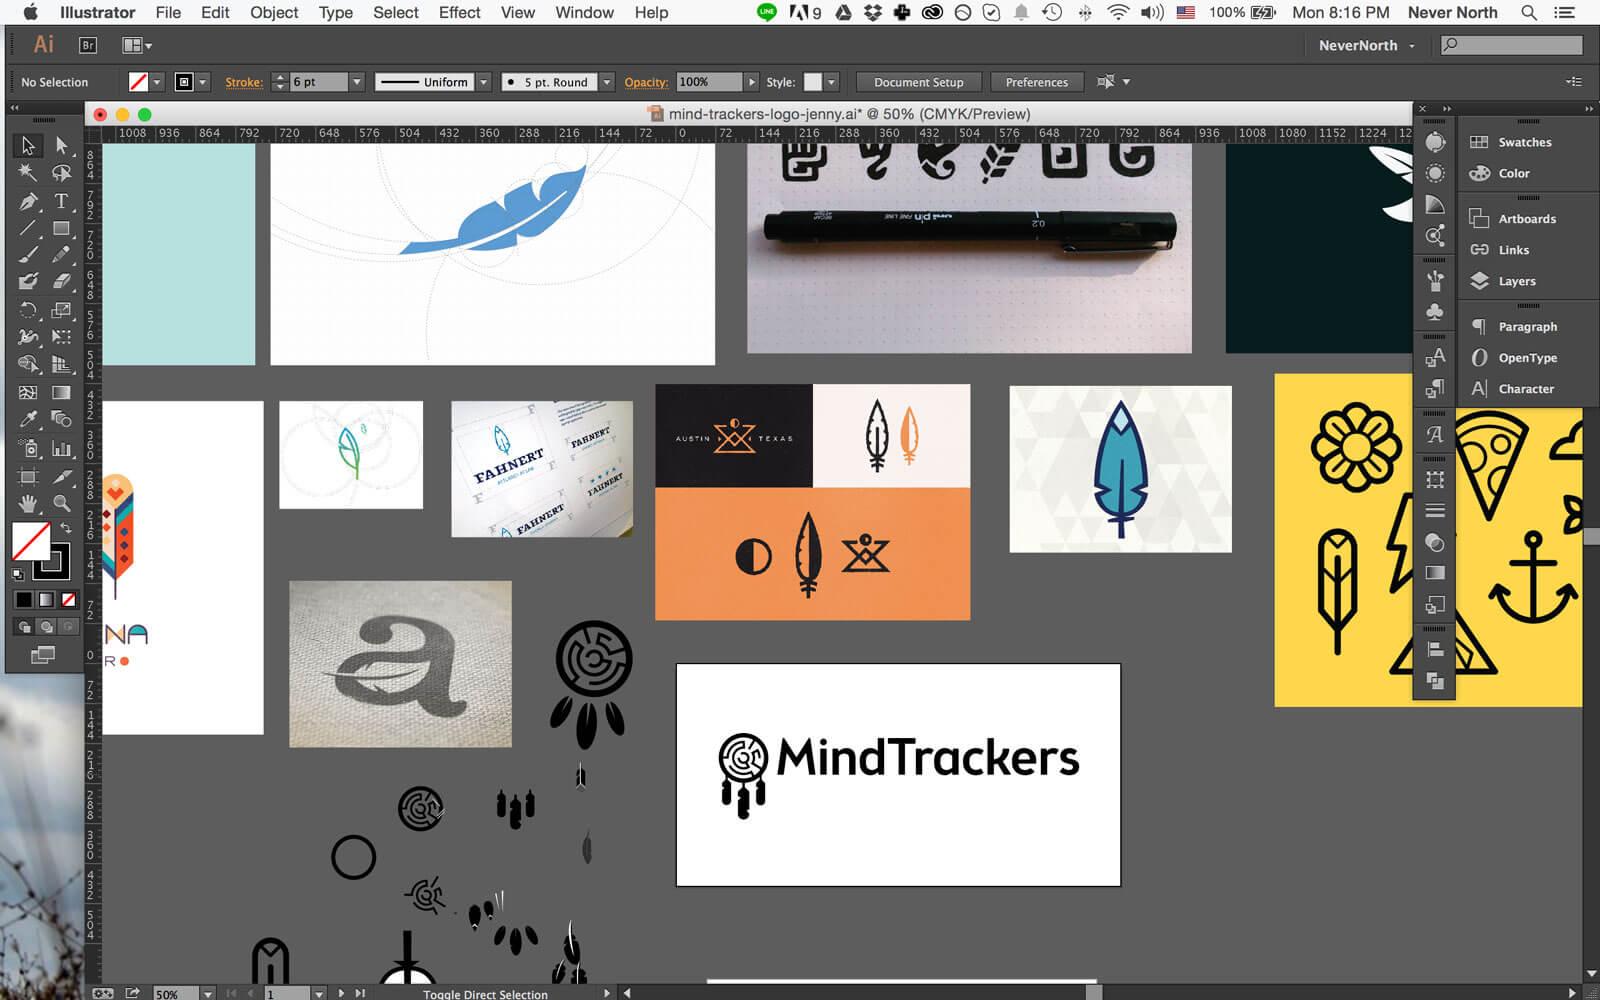 mind-trackers-logo-work-in-progress